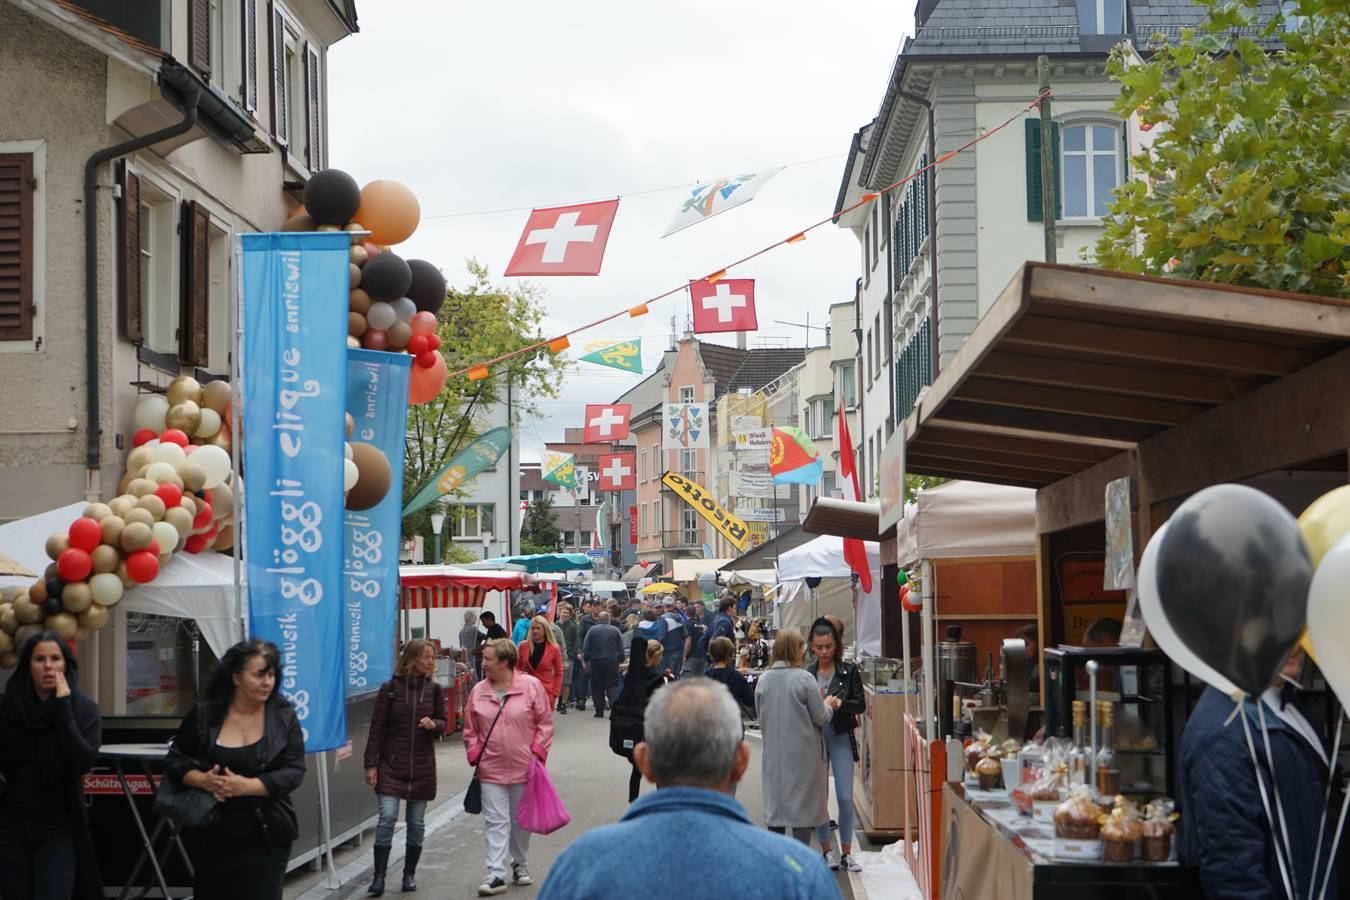 Giruno Taufe in Weinfelden (© FM1Today)